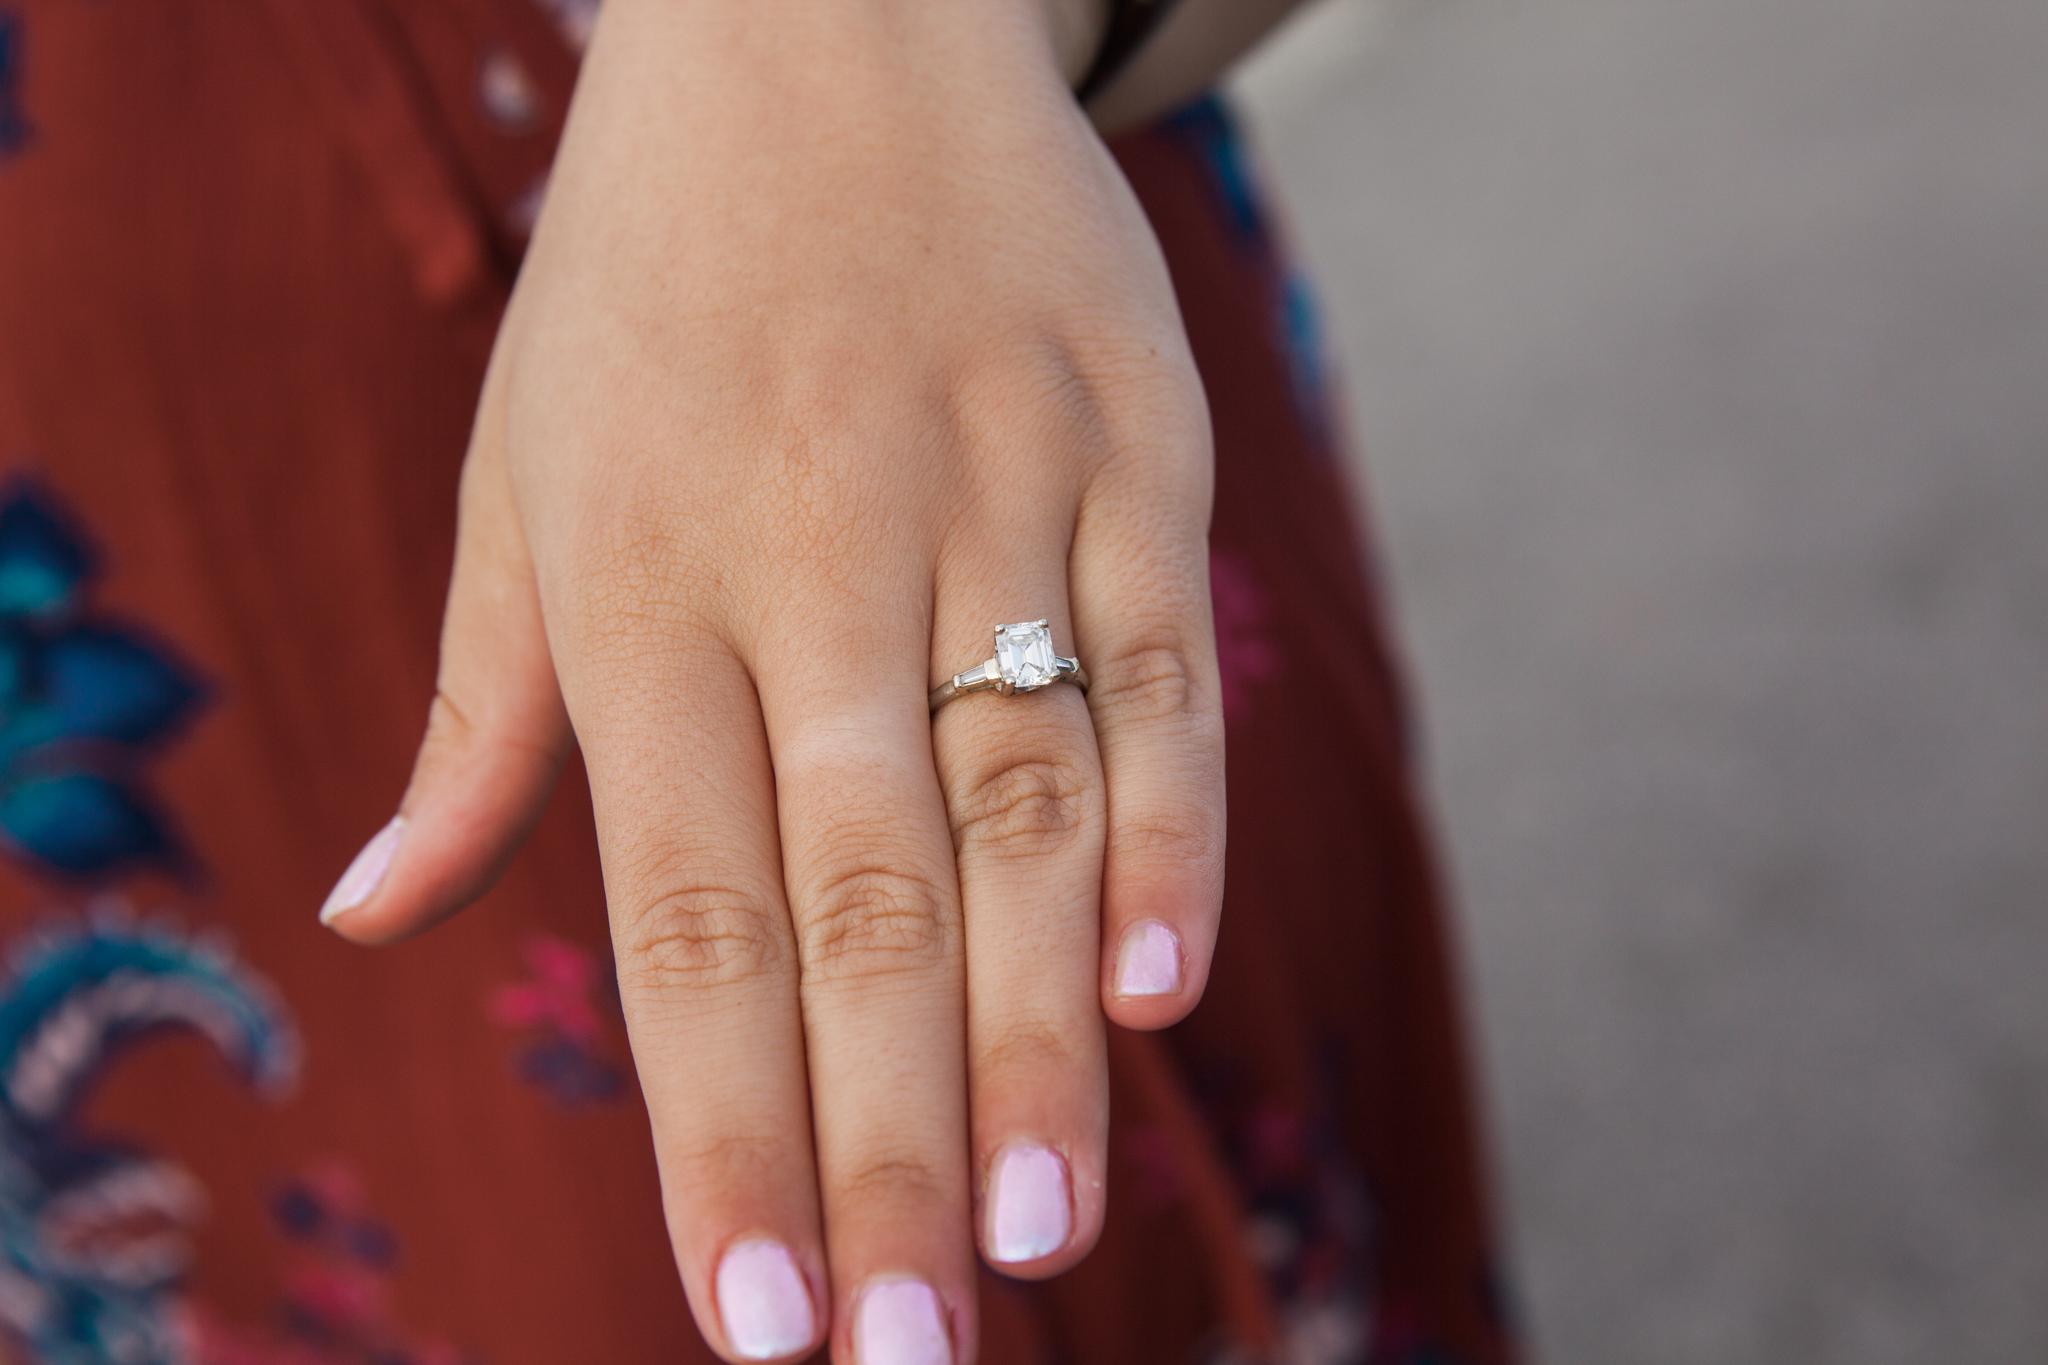 Heidi Kirn Ogunquit Surprise Proposal Engagement-69340.jpg